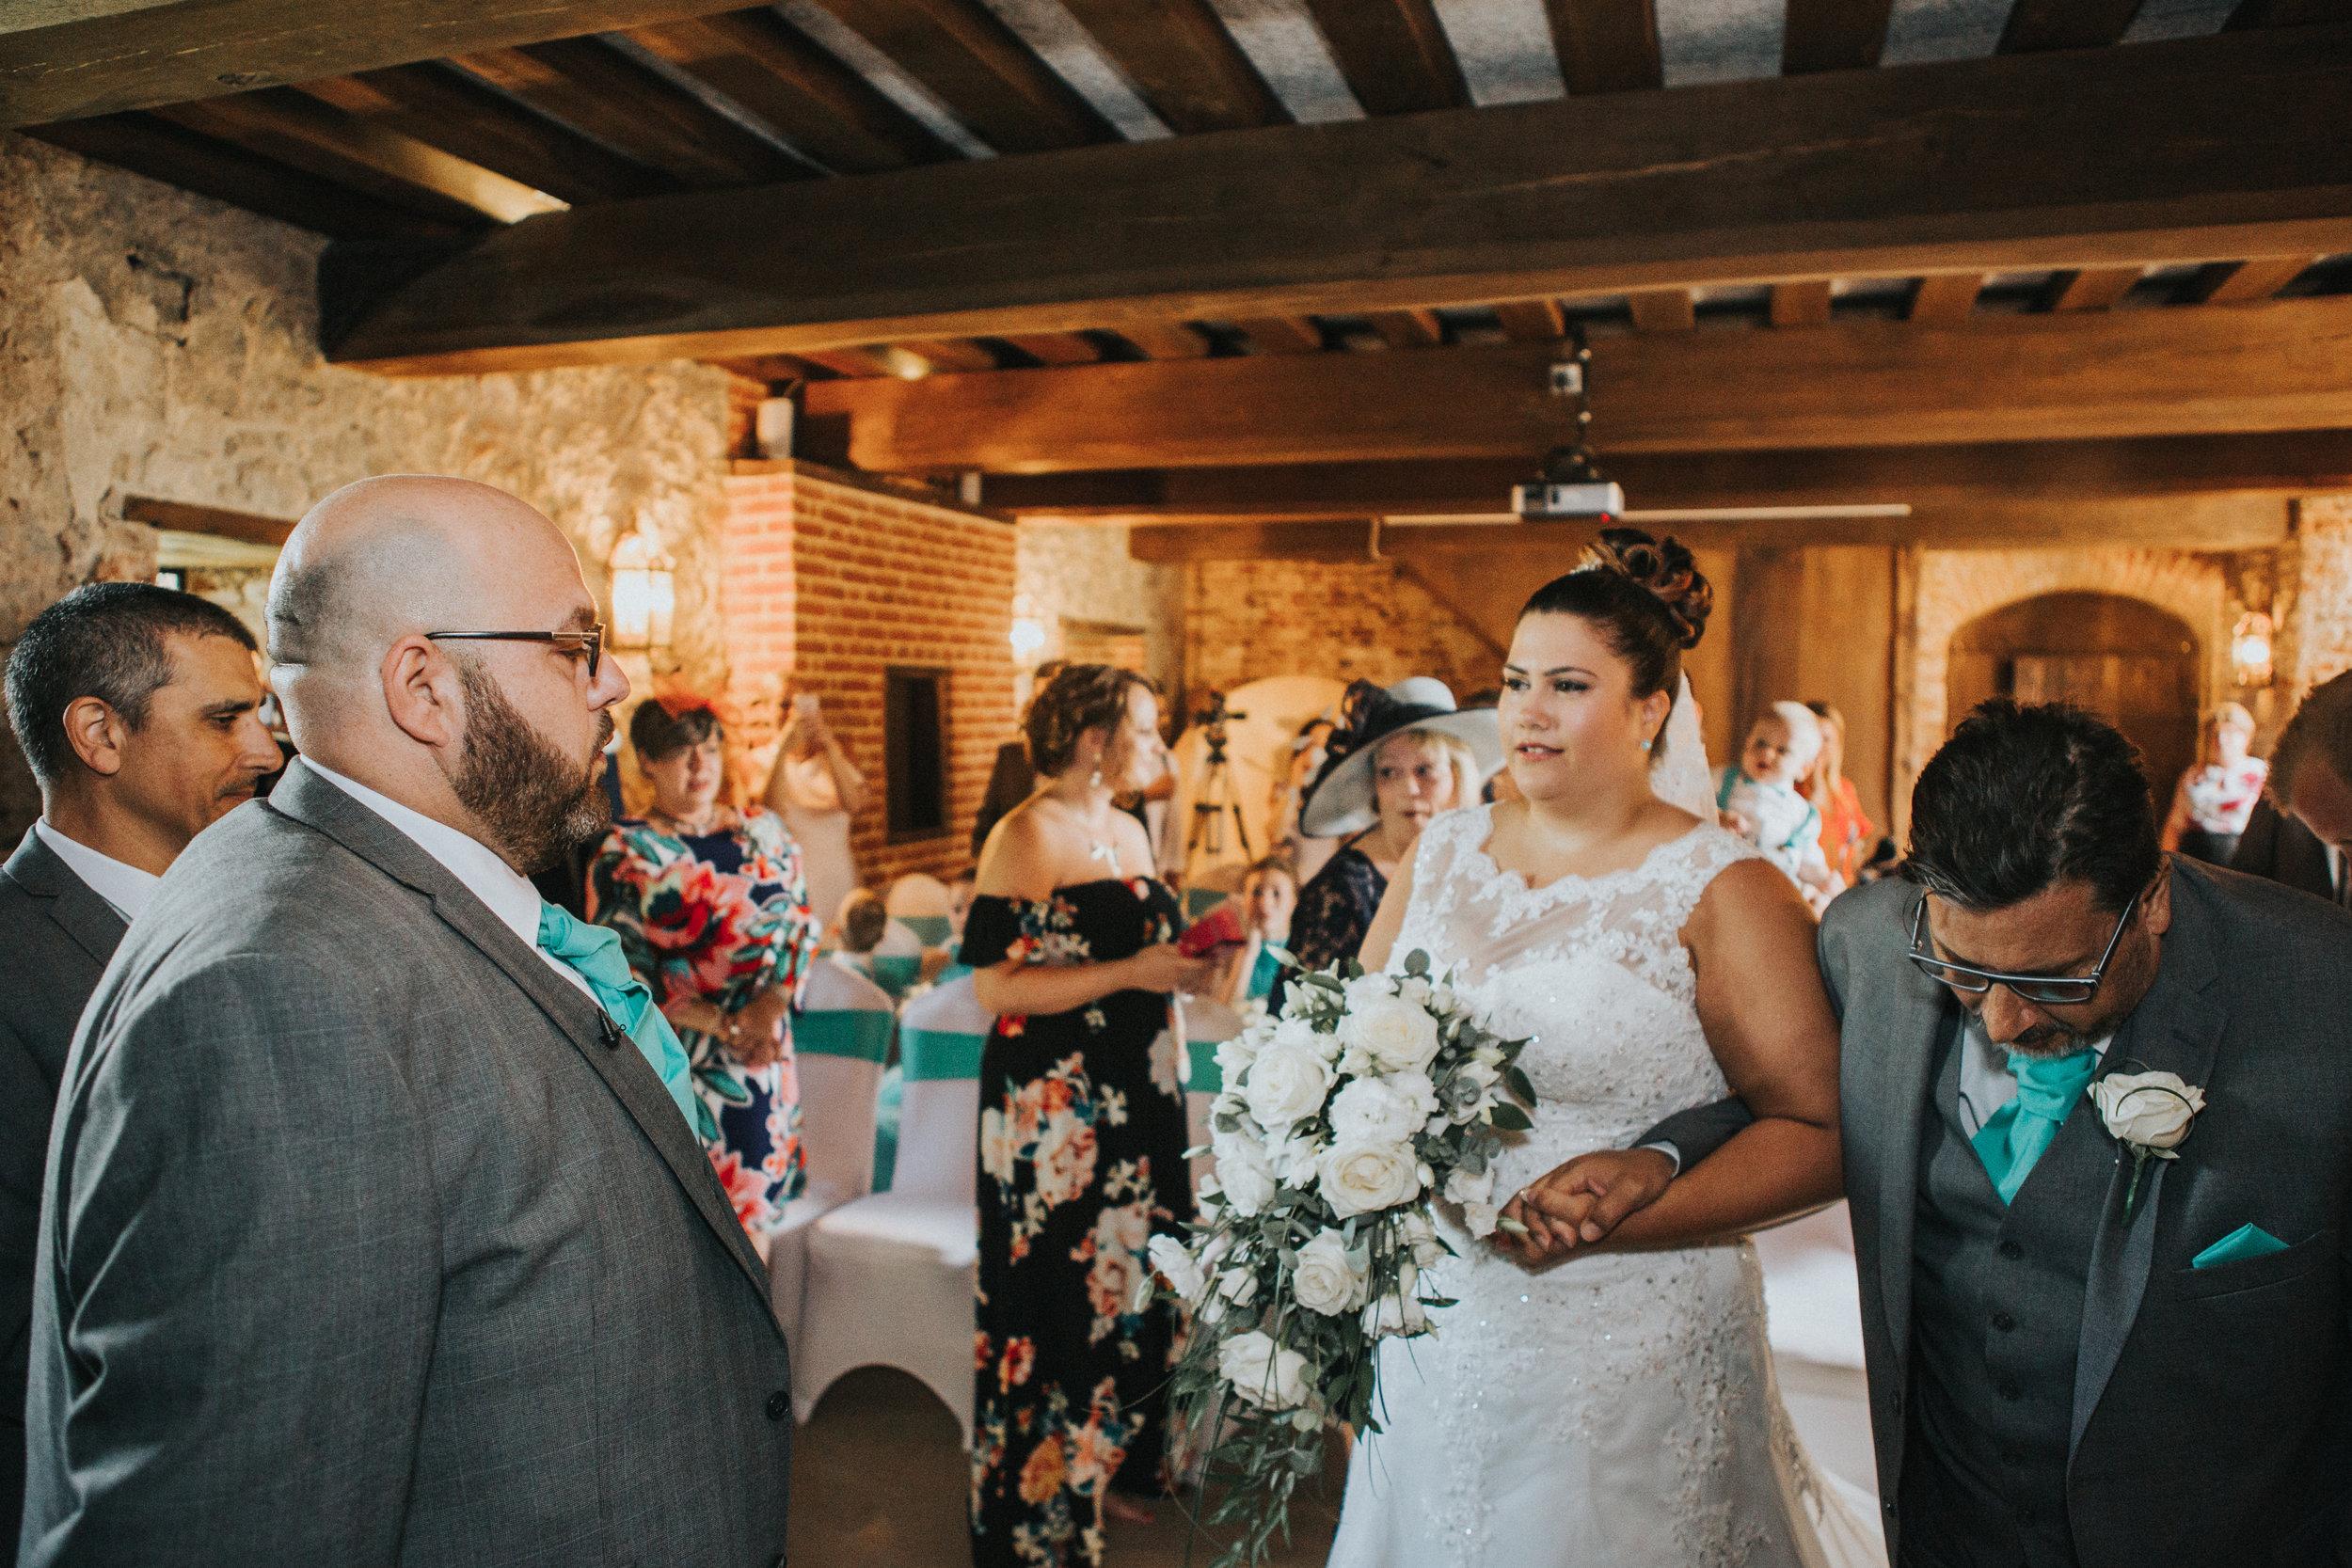 westenhangar-castle-kent-london-wedding-photography-36